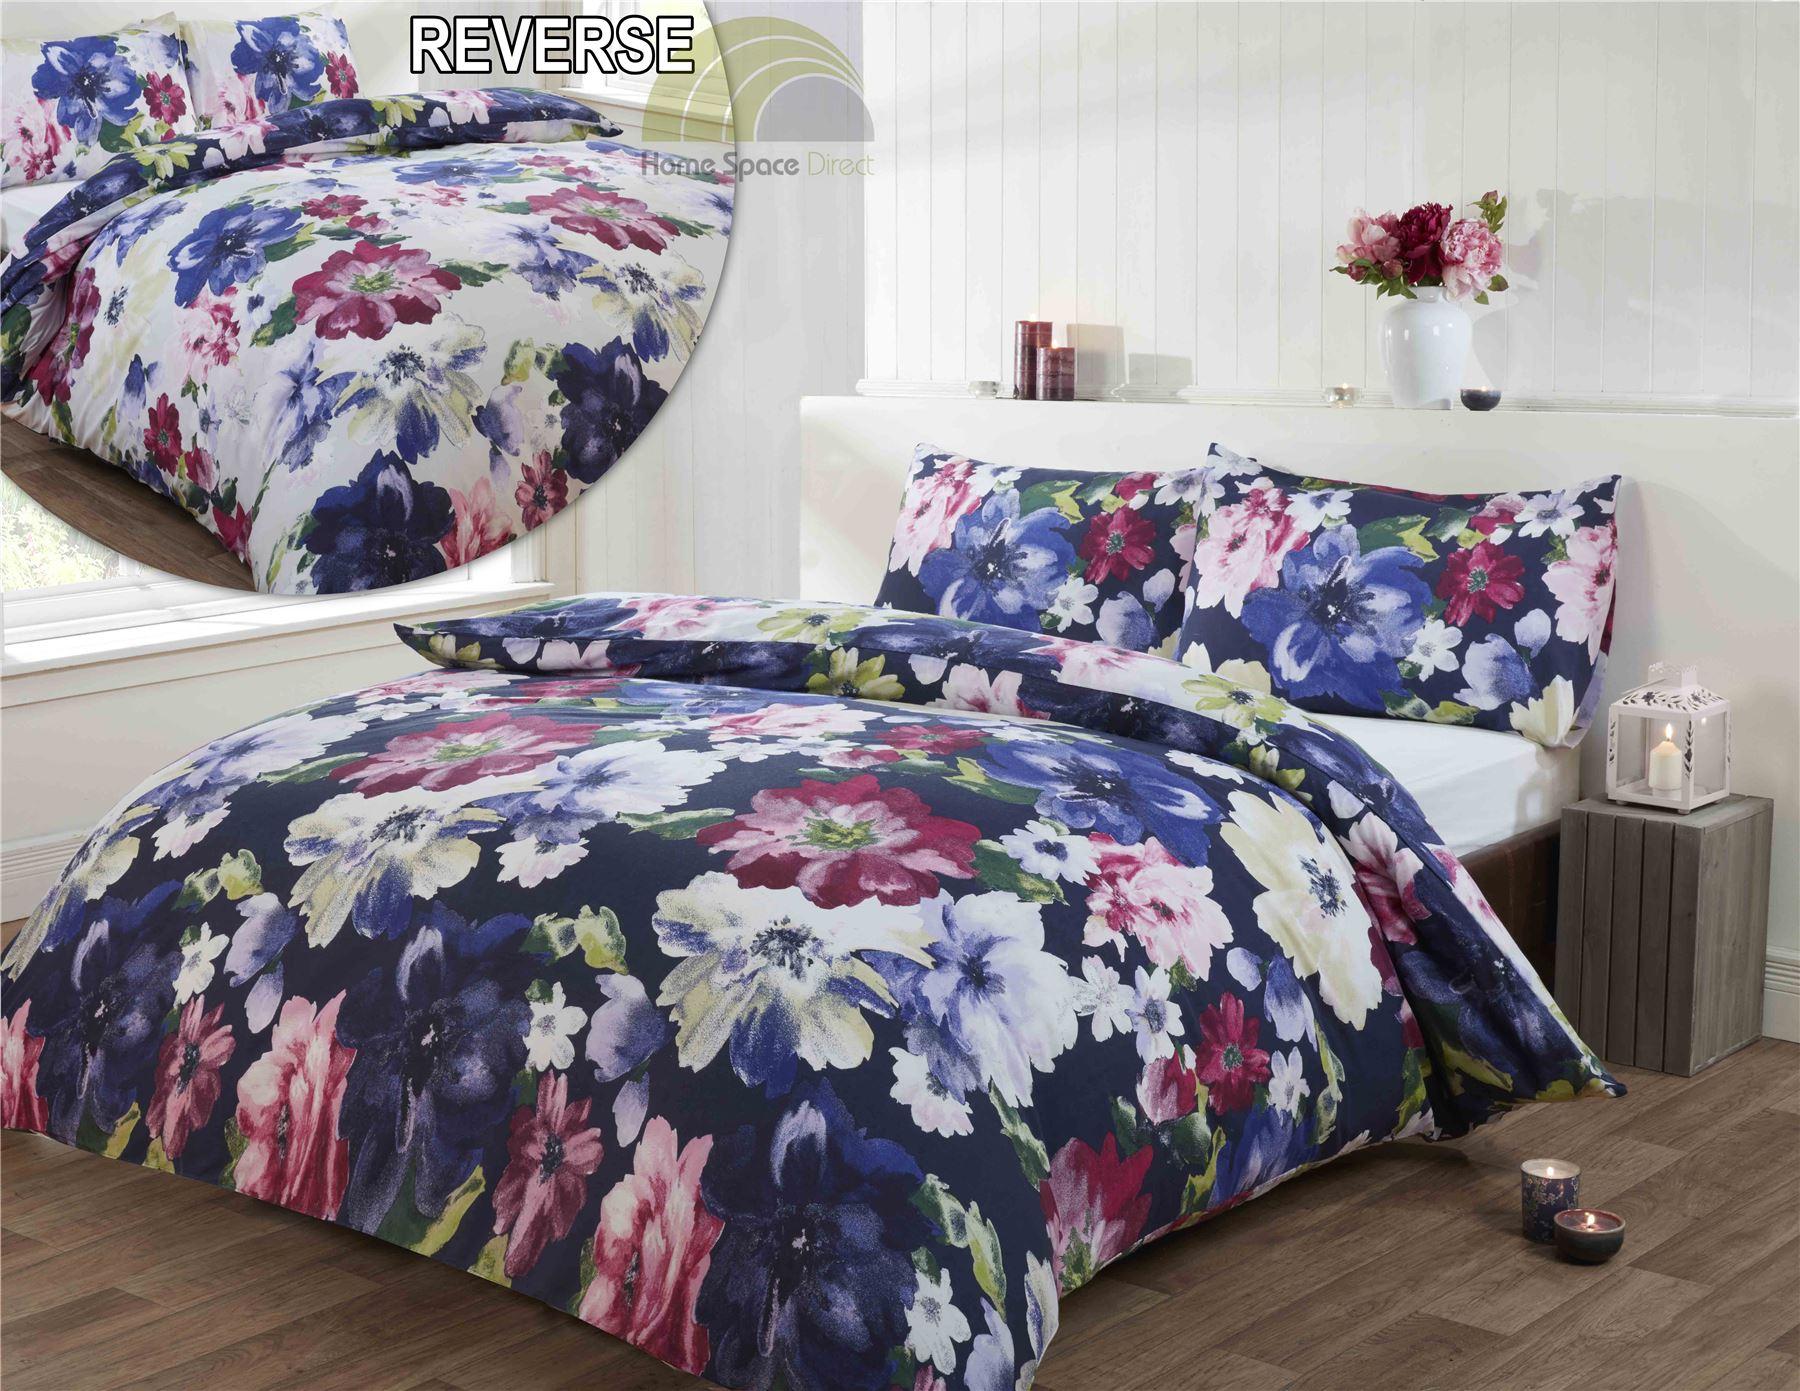 Floral Modern Quilt Duvet Cover Amp Pillowcase Bedding Bed